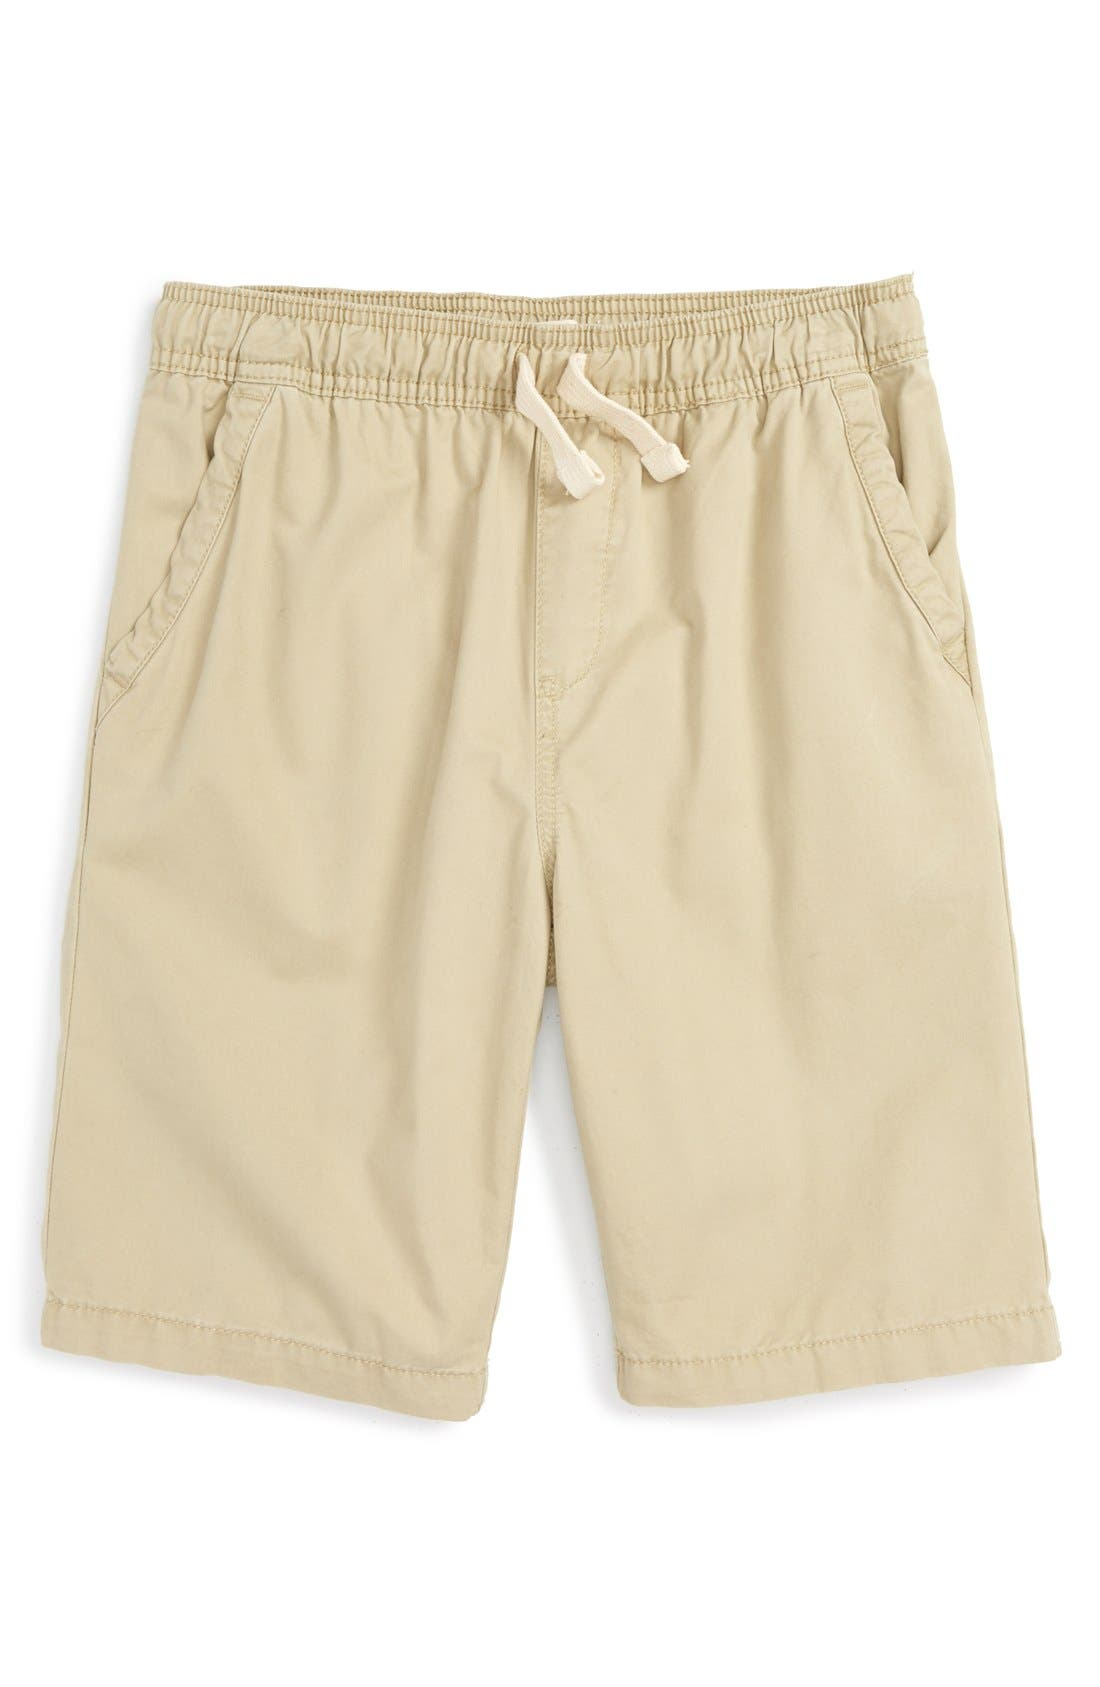 Tucker + Tate Cotton Twill Shorts (Toddler Boys, Little Boys & Big Boys)